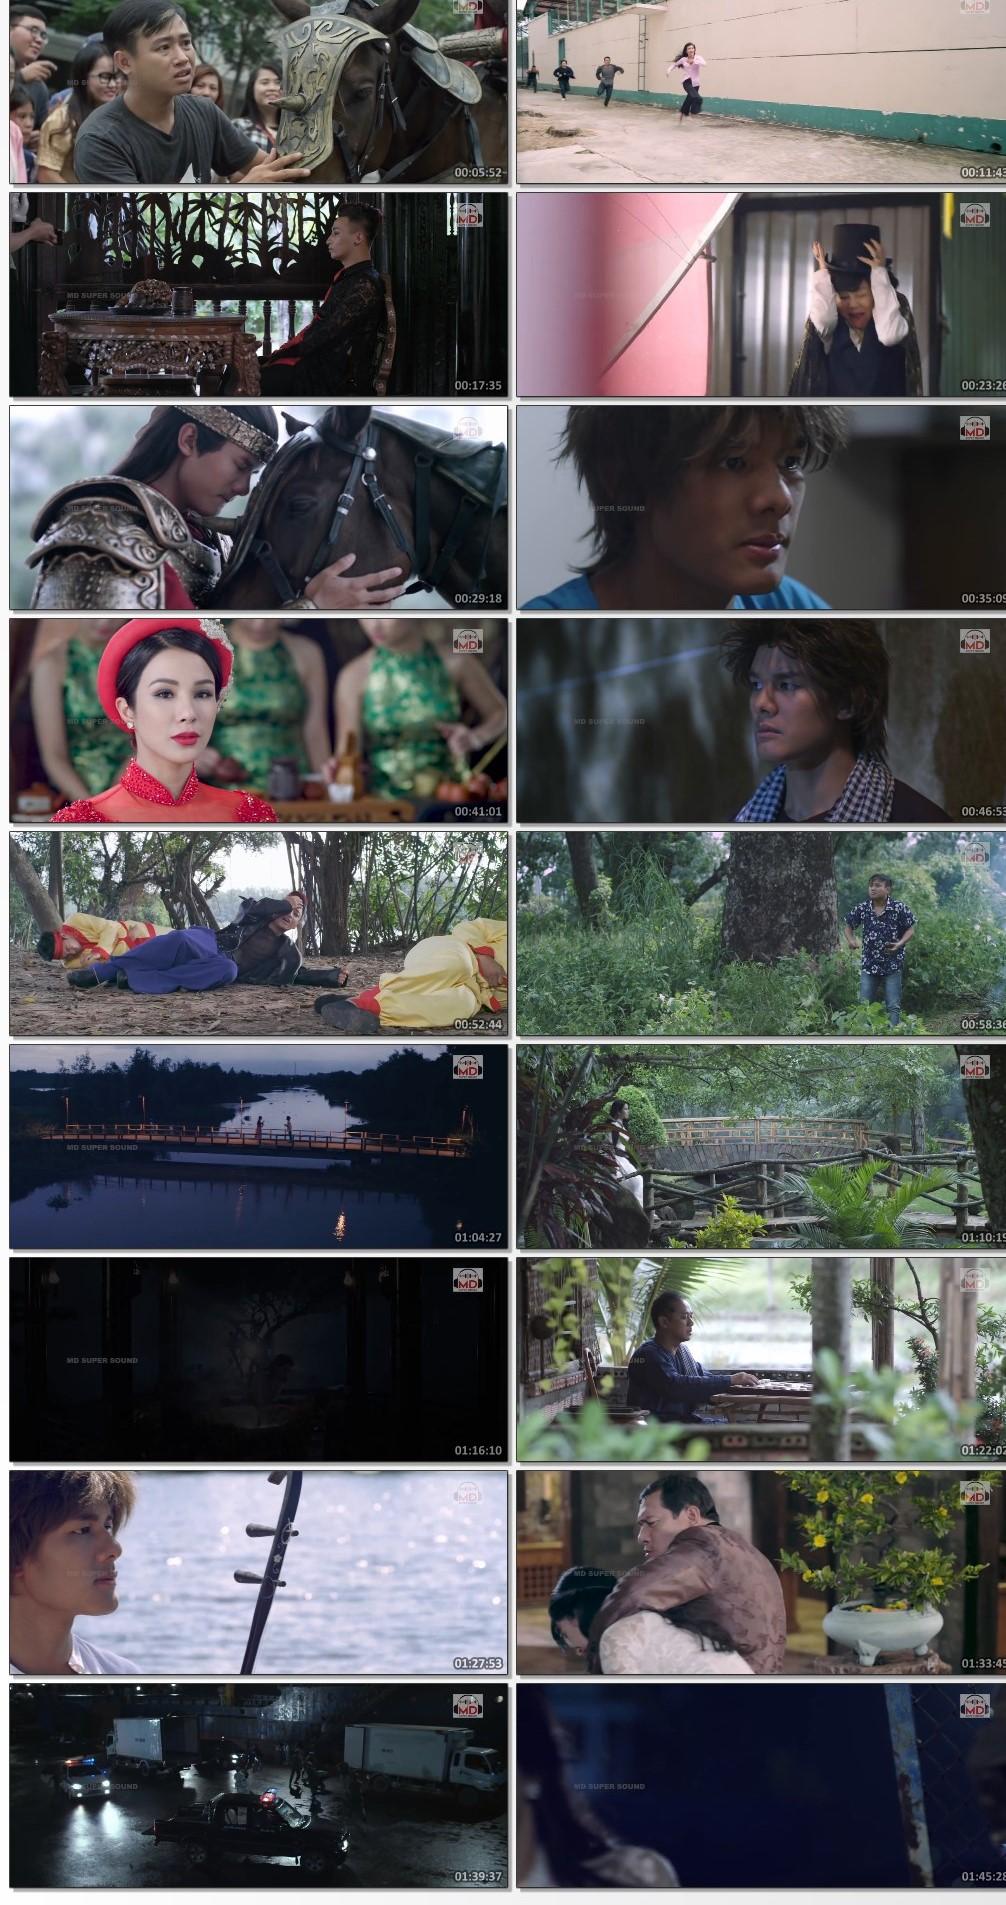 Luc-Van-Tien-Kungfu-Hustle-720p-HD-mkv-thumbs